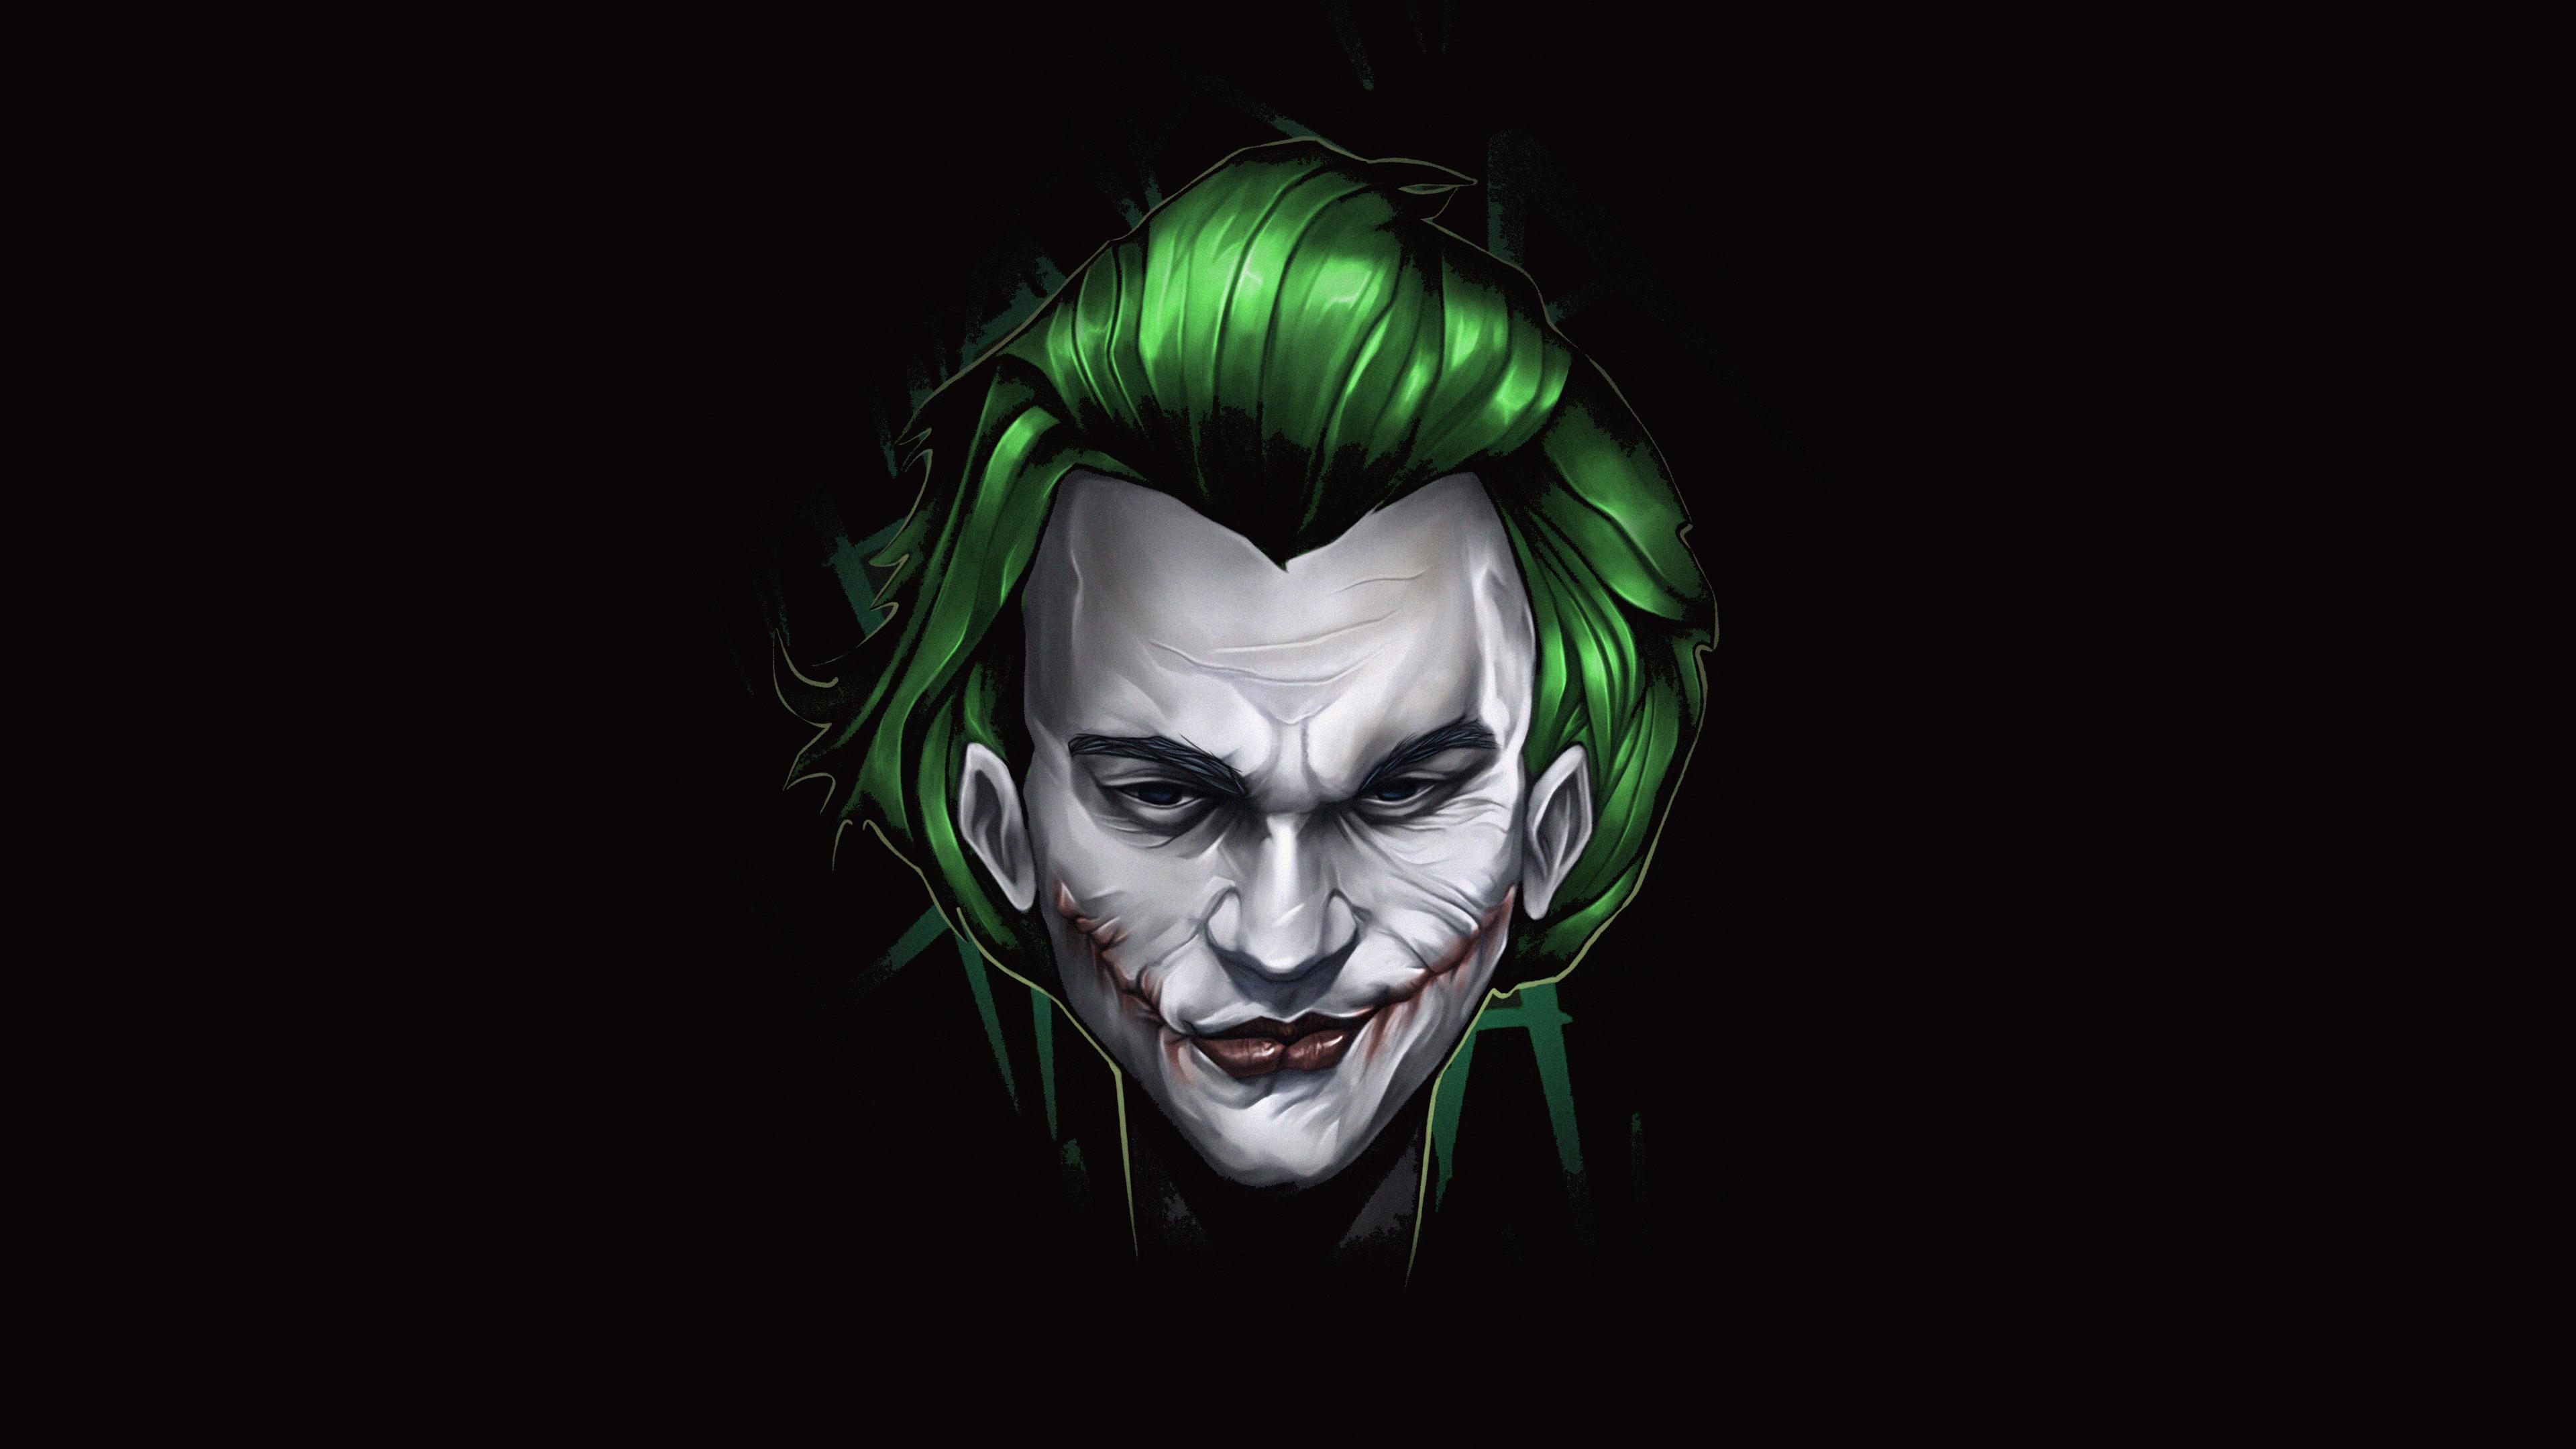 Joker Art Background Image HD HD Wallpapers 3840x2160